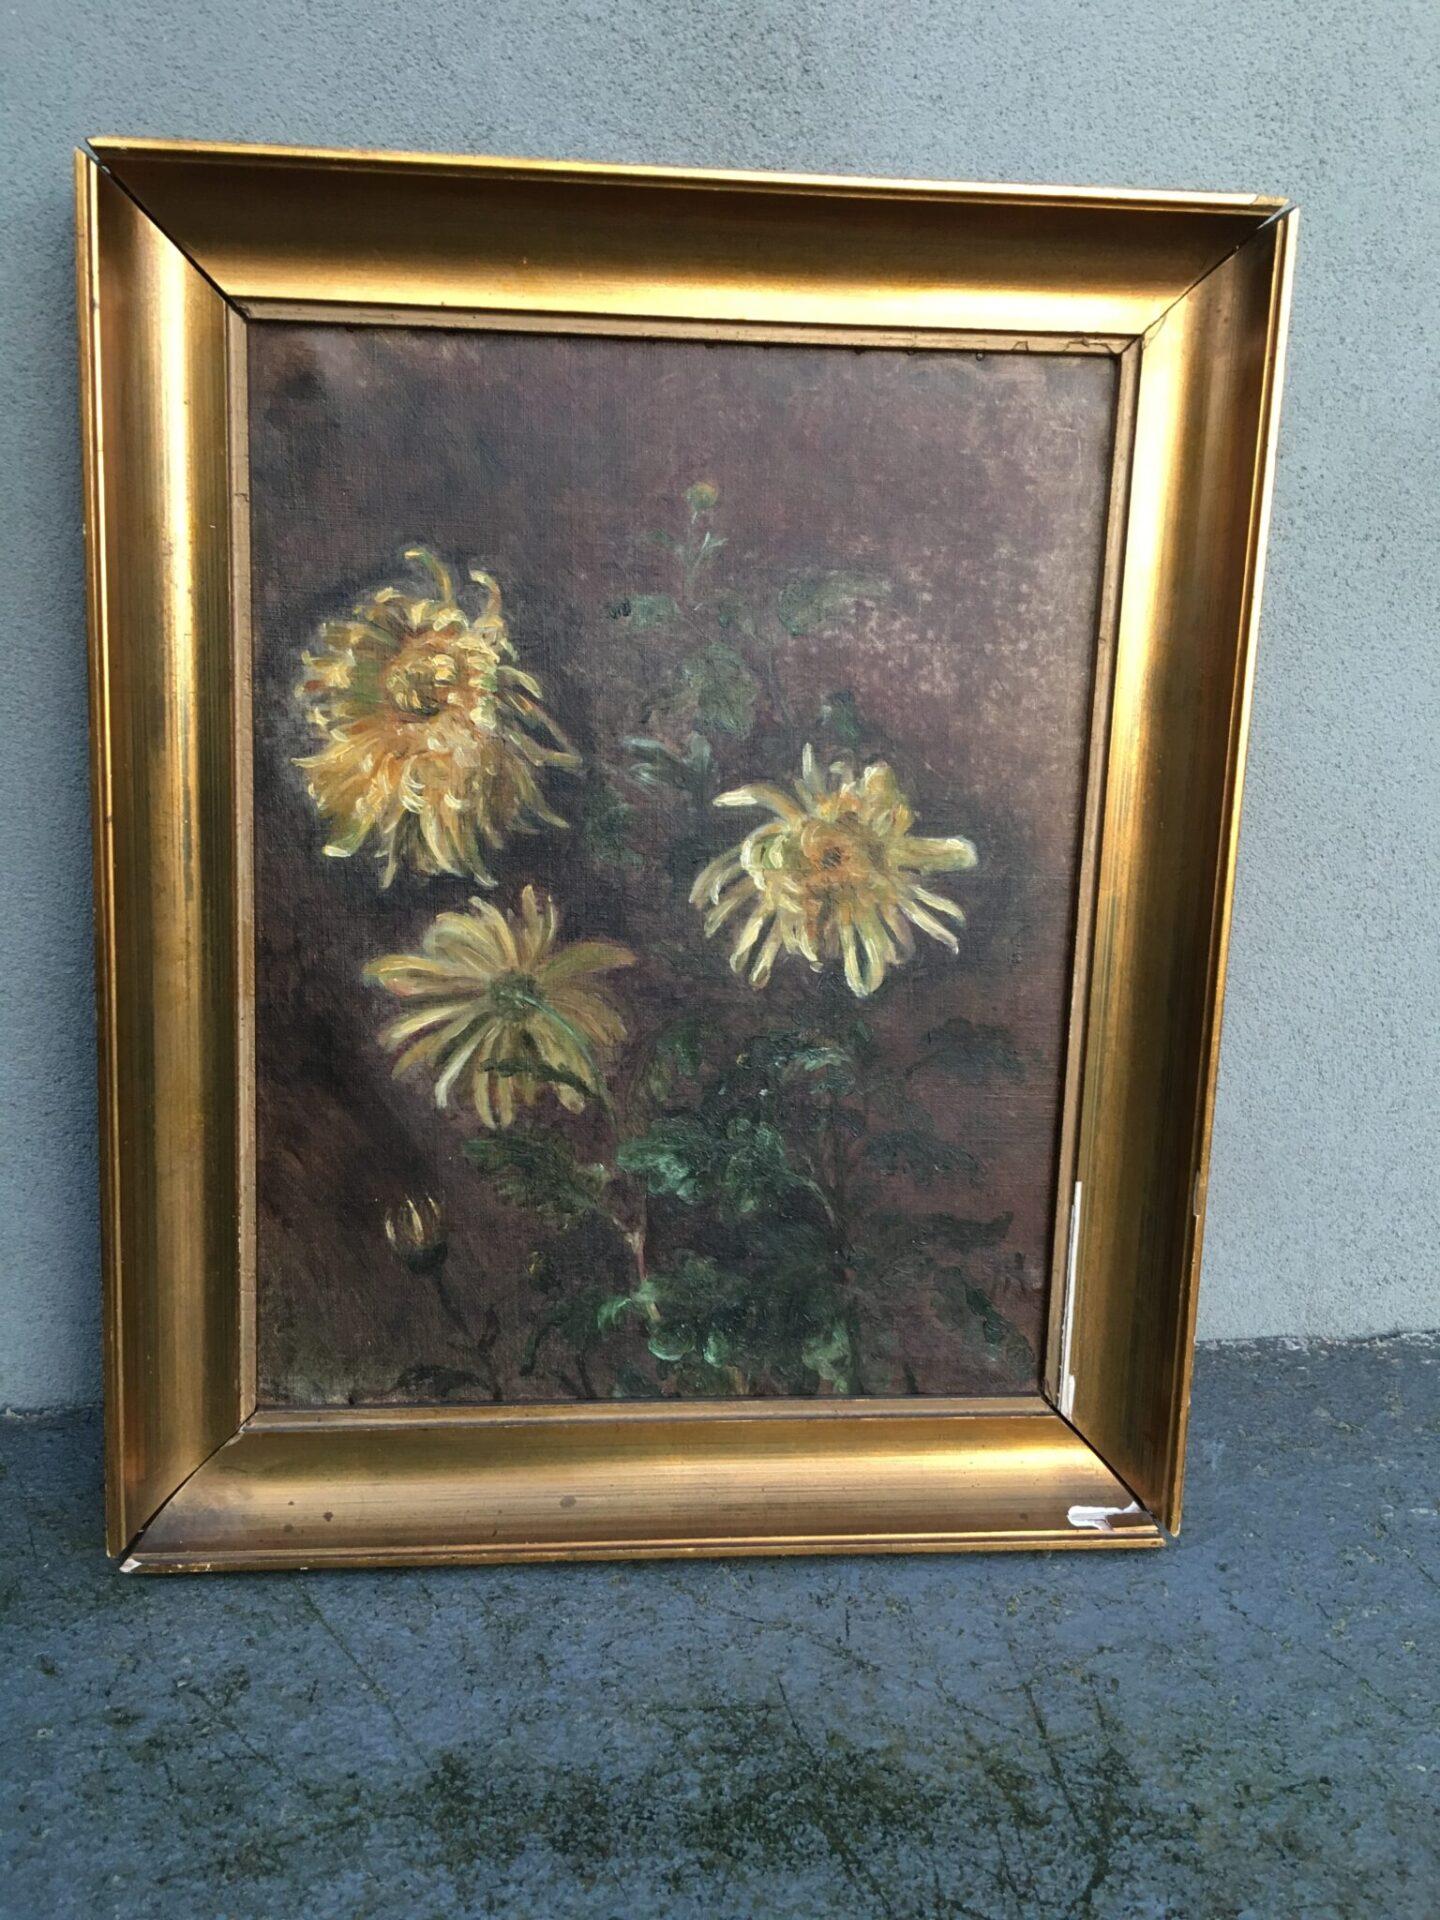 Lille fint lille blomstermaleri, 37x46 cm, ingen signatur, pris 300 kr